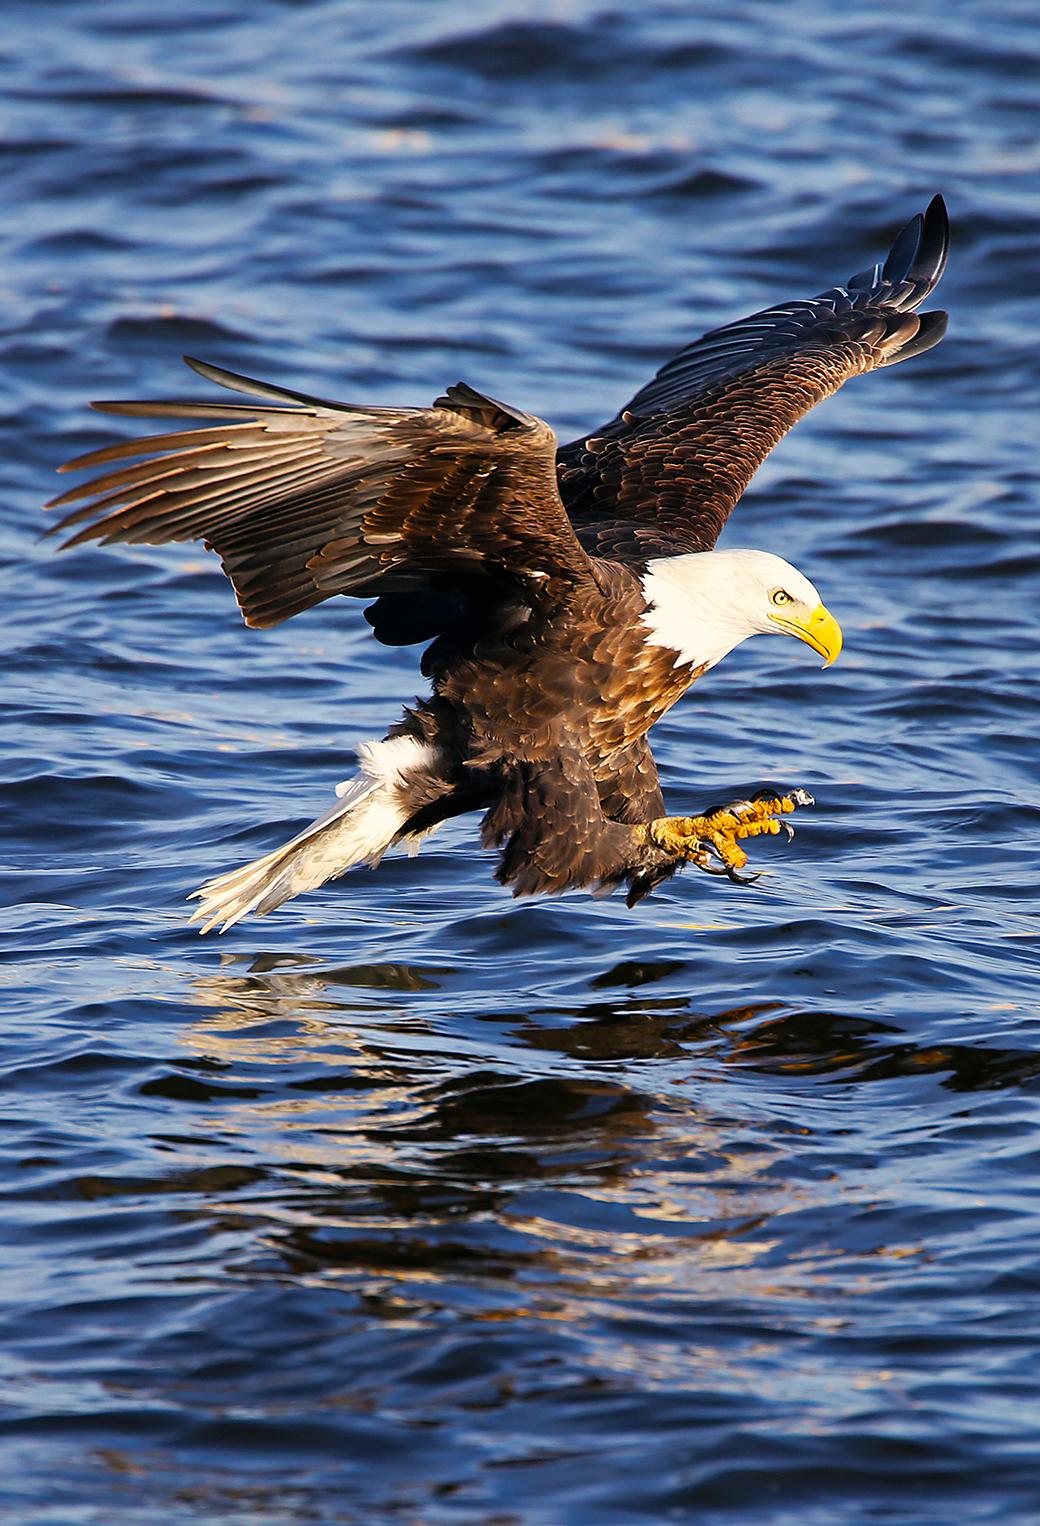 eagle 7.7 download free